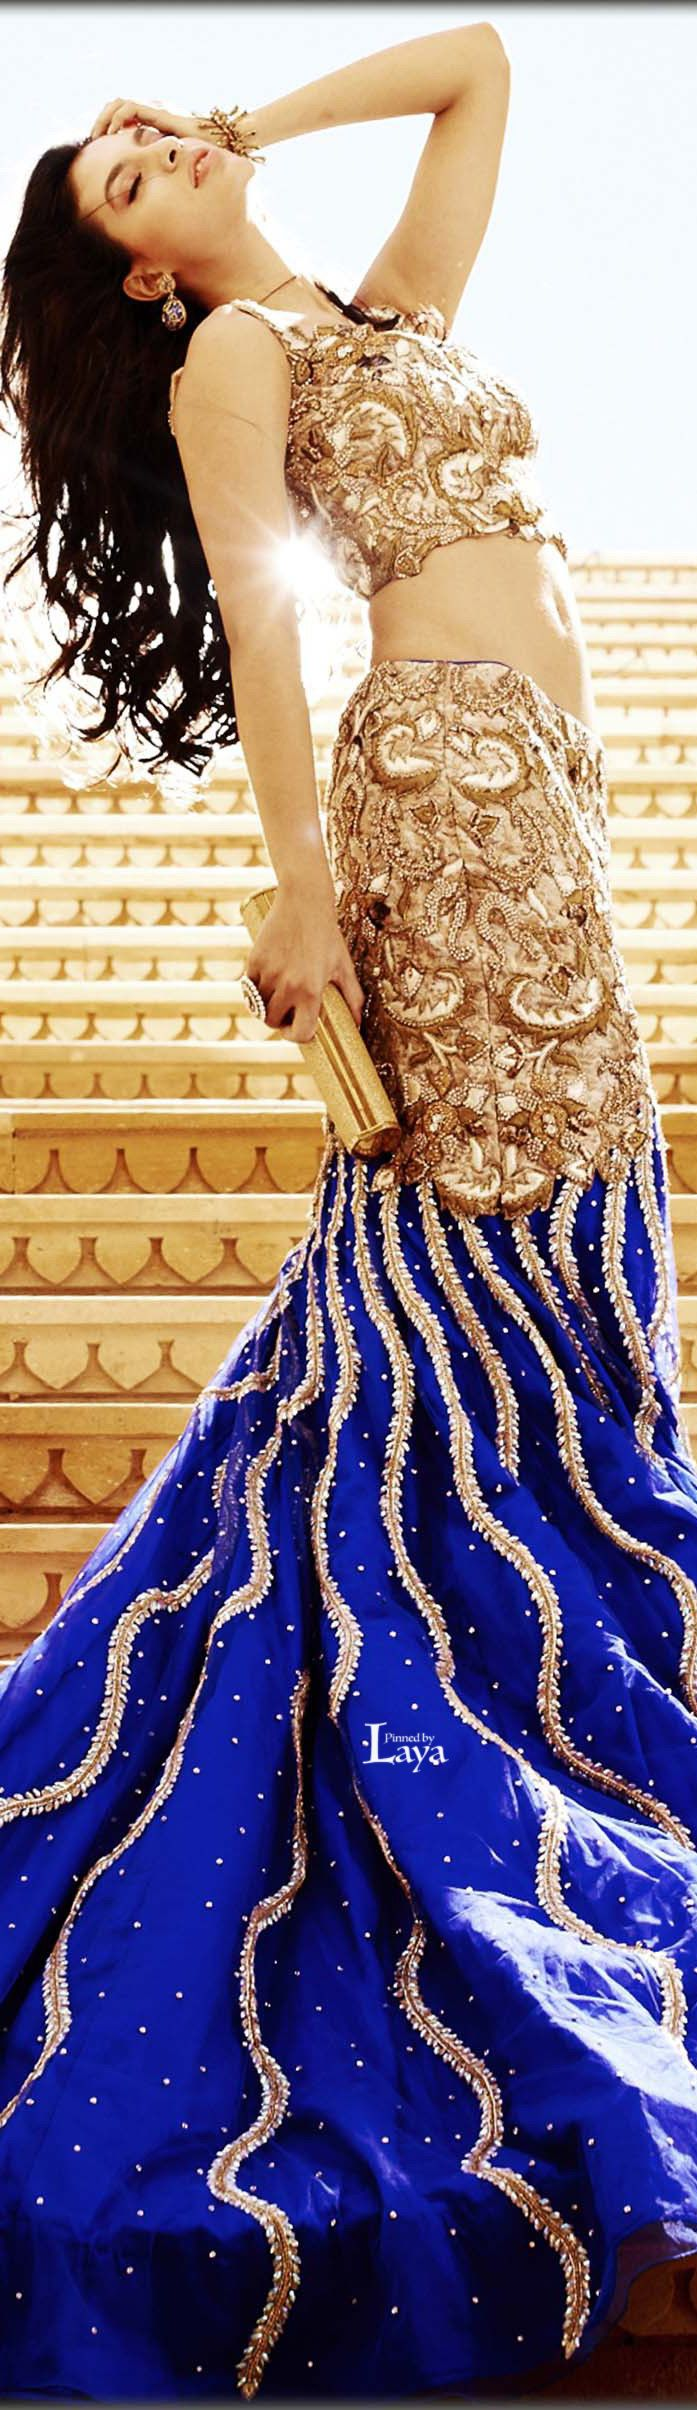 30 Latest Mermaid Wedding Dresses for Brides – SheIdeas